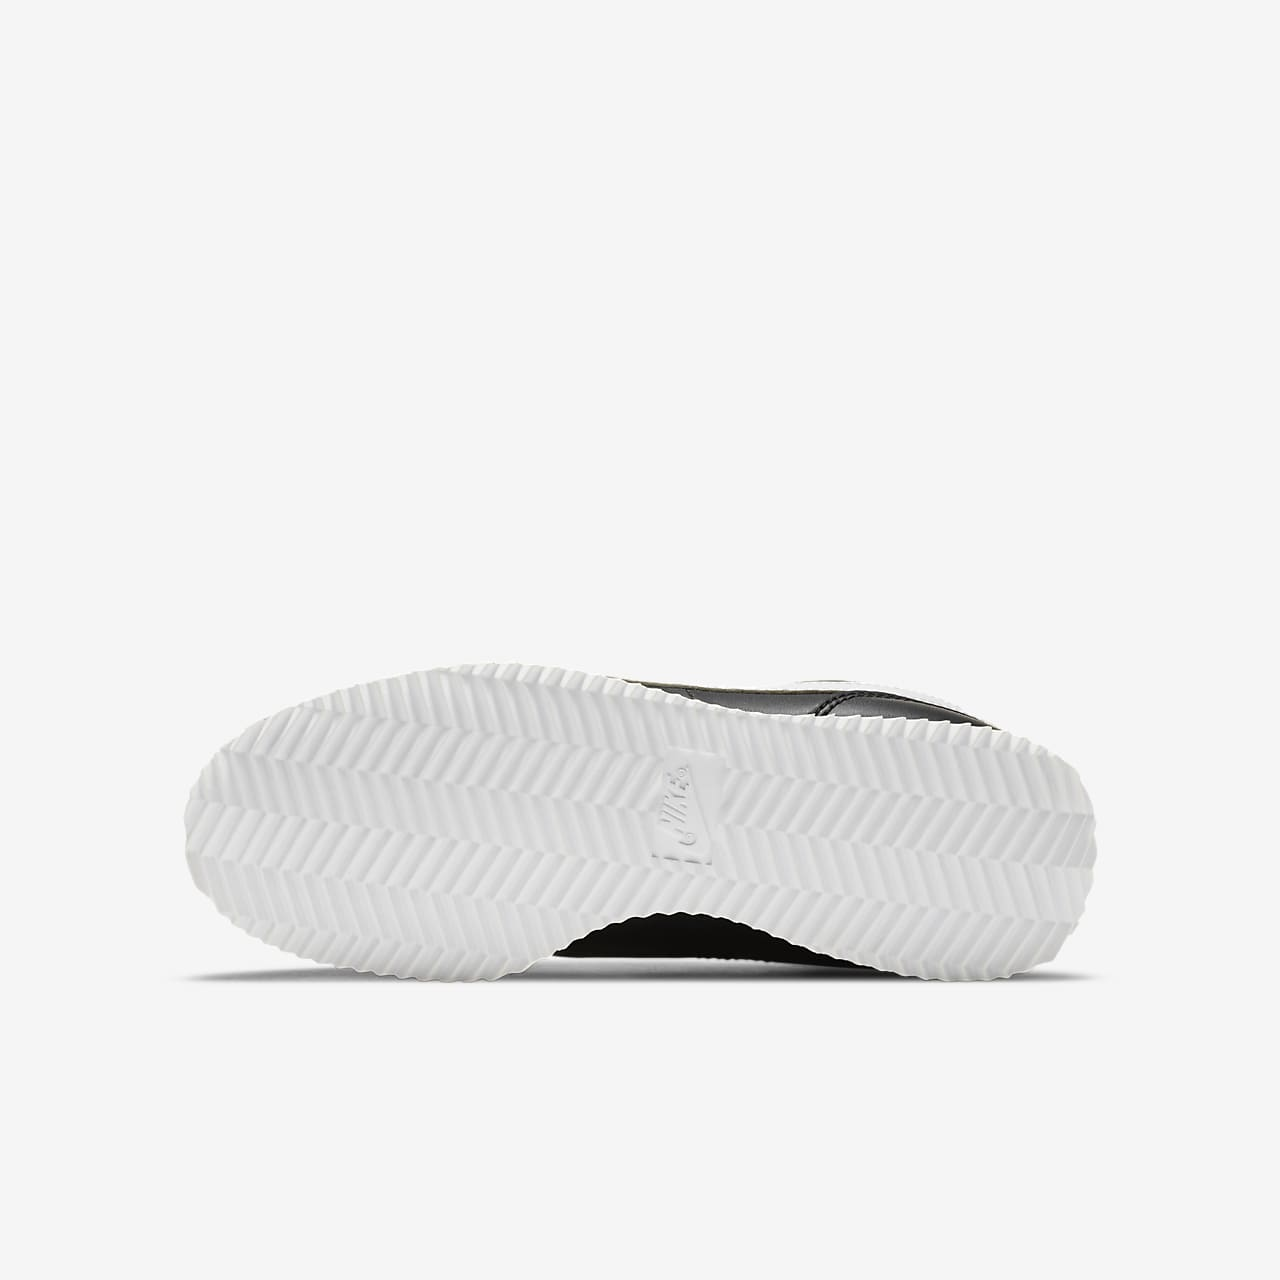 reputable site d19c7 6ffa0 Low Resolution Nike Cortez Basic SL Kinderschoen Nike Cortez Basic SL  Kinderschoen